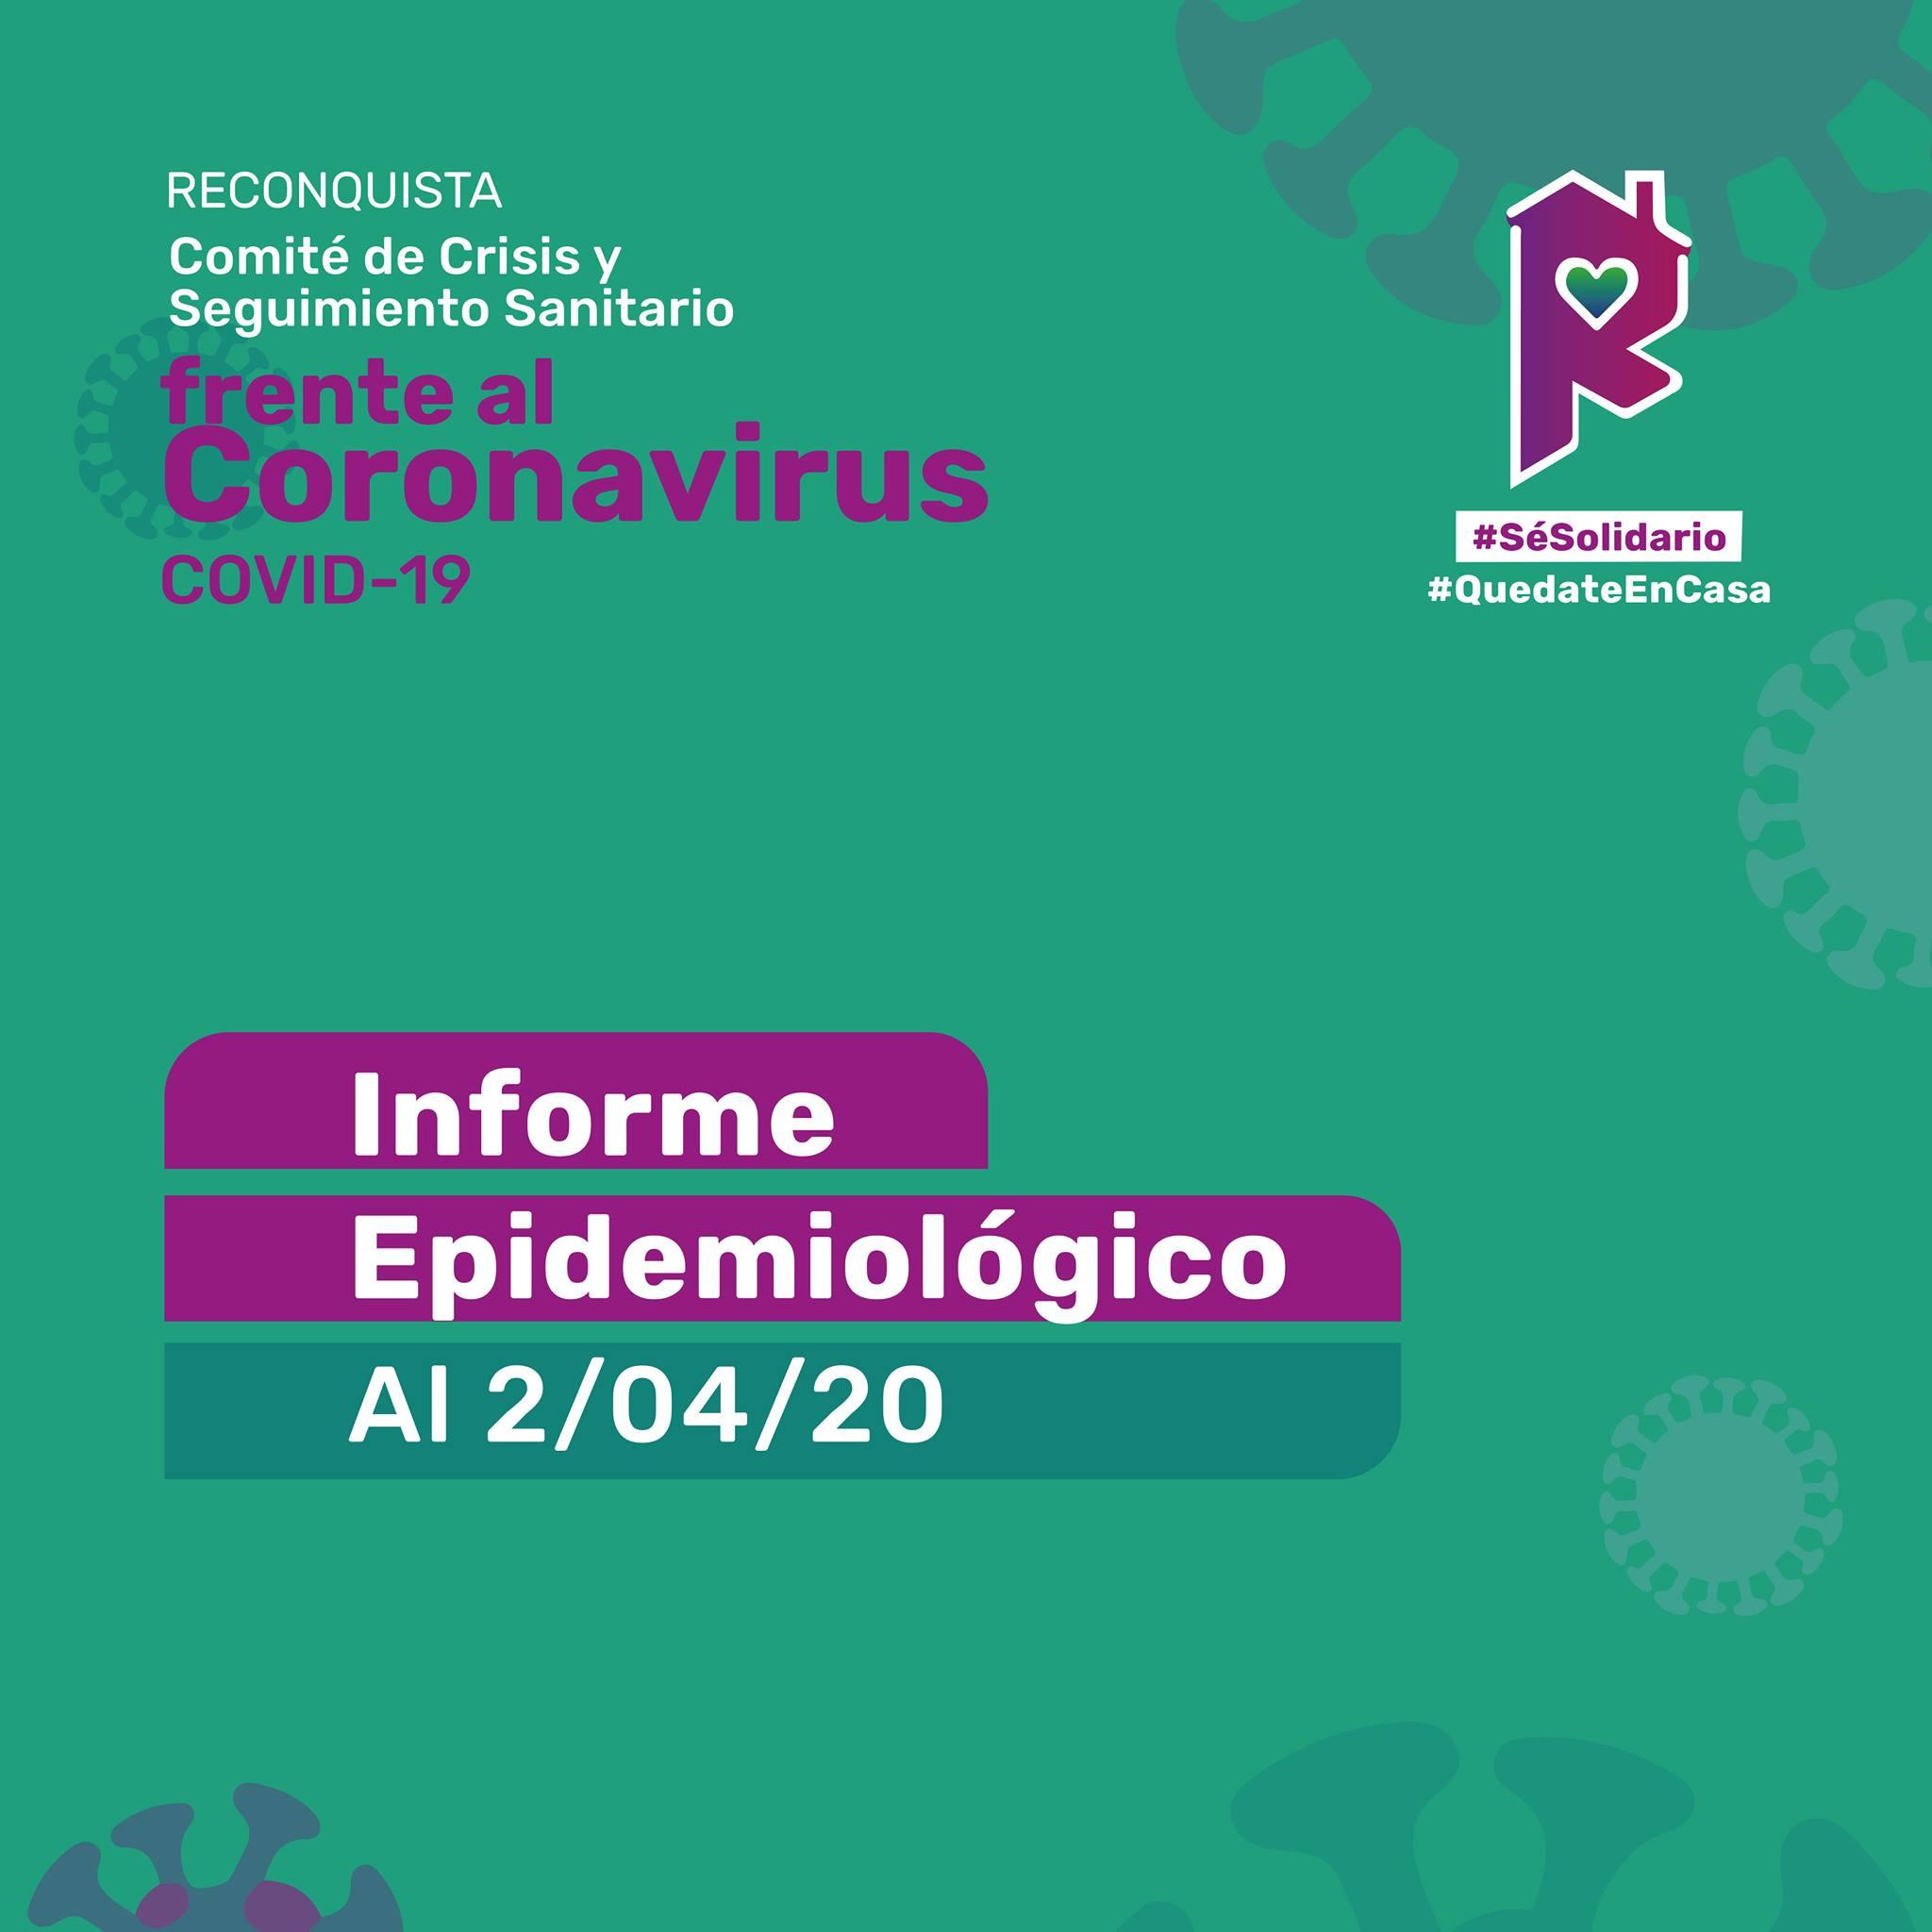 Reconquista: informe epidemiológico al 2 de abril a las 7 h